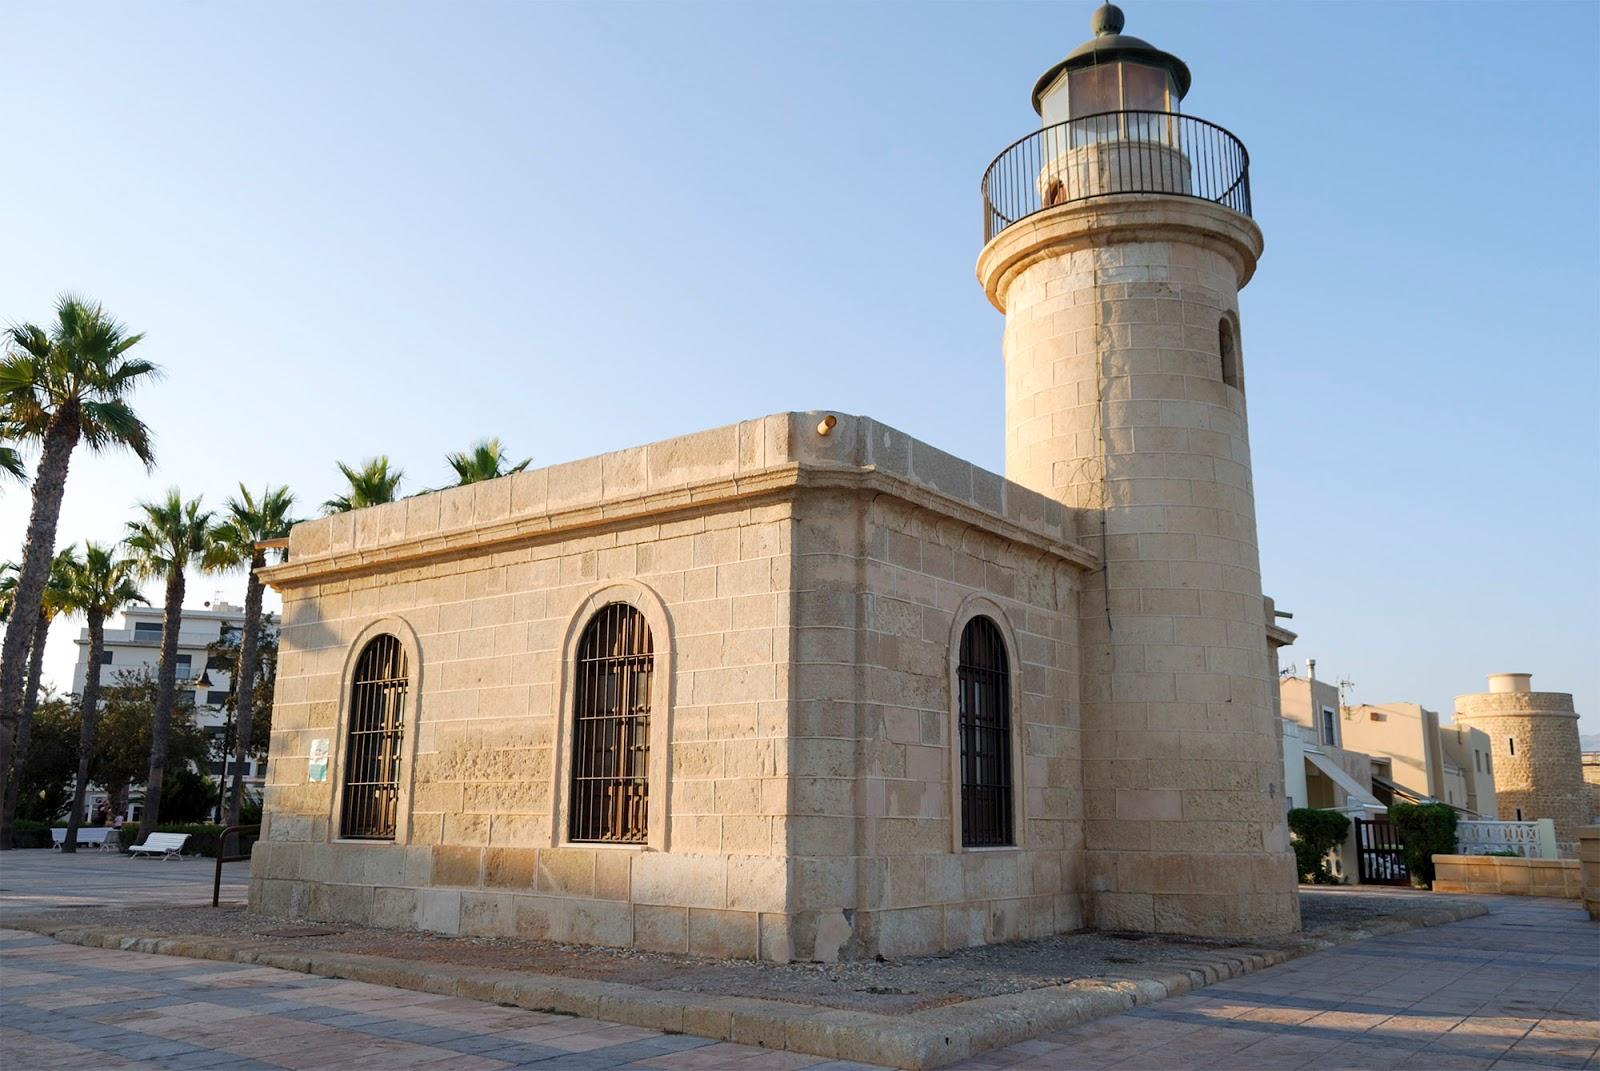 almeria beach spain roquetas mar coast old town lighthouse